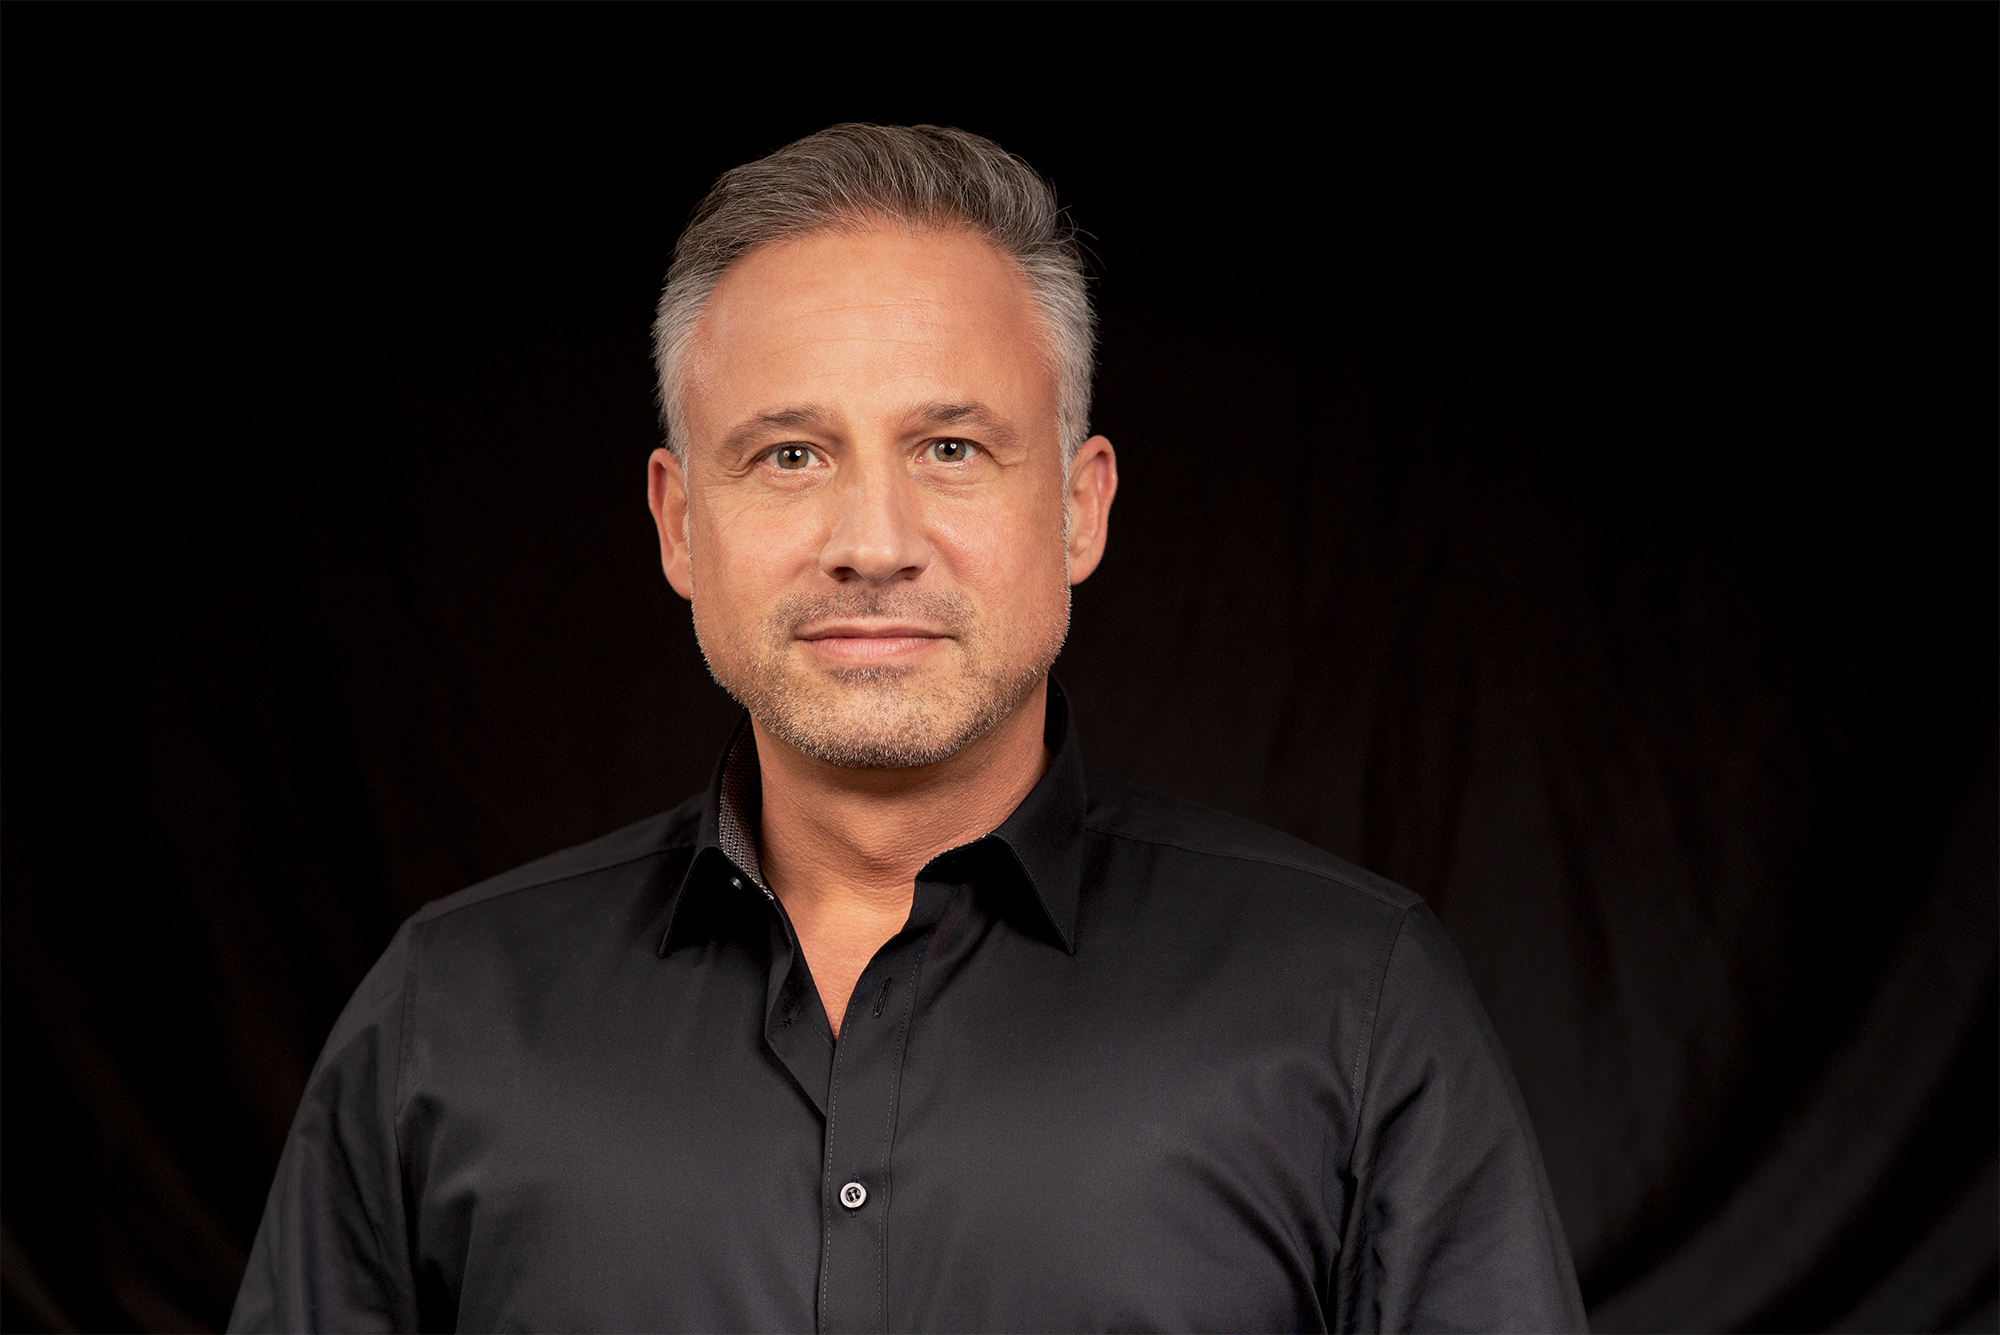 Marc Schieder ist Chief Information (Security) Officer bei Dracoon. (Bild: Dracoon GmbH)